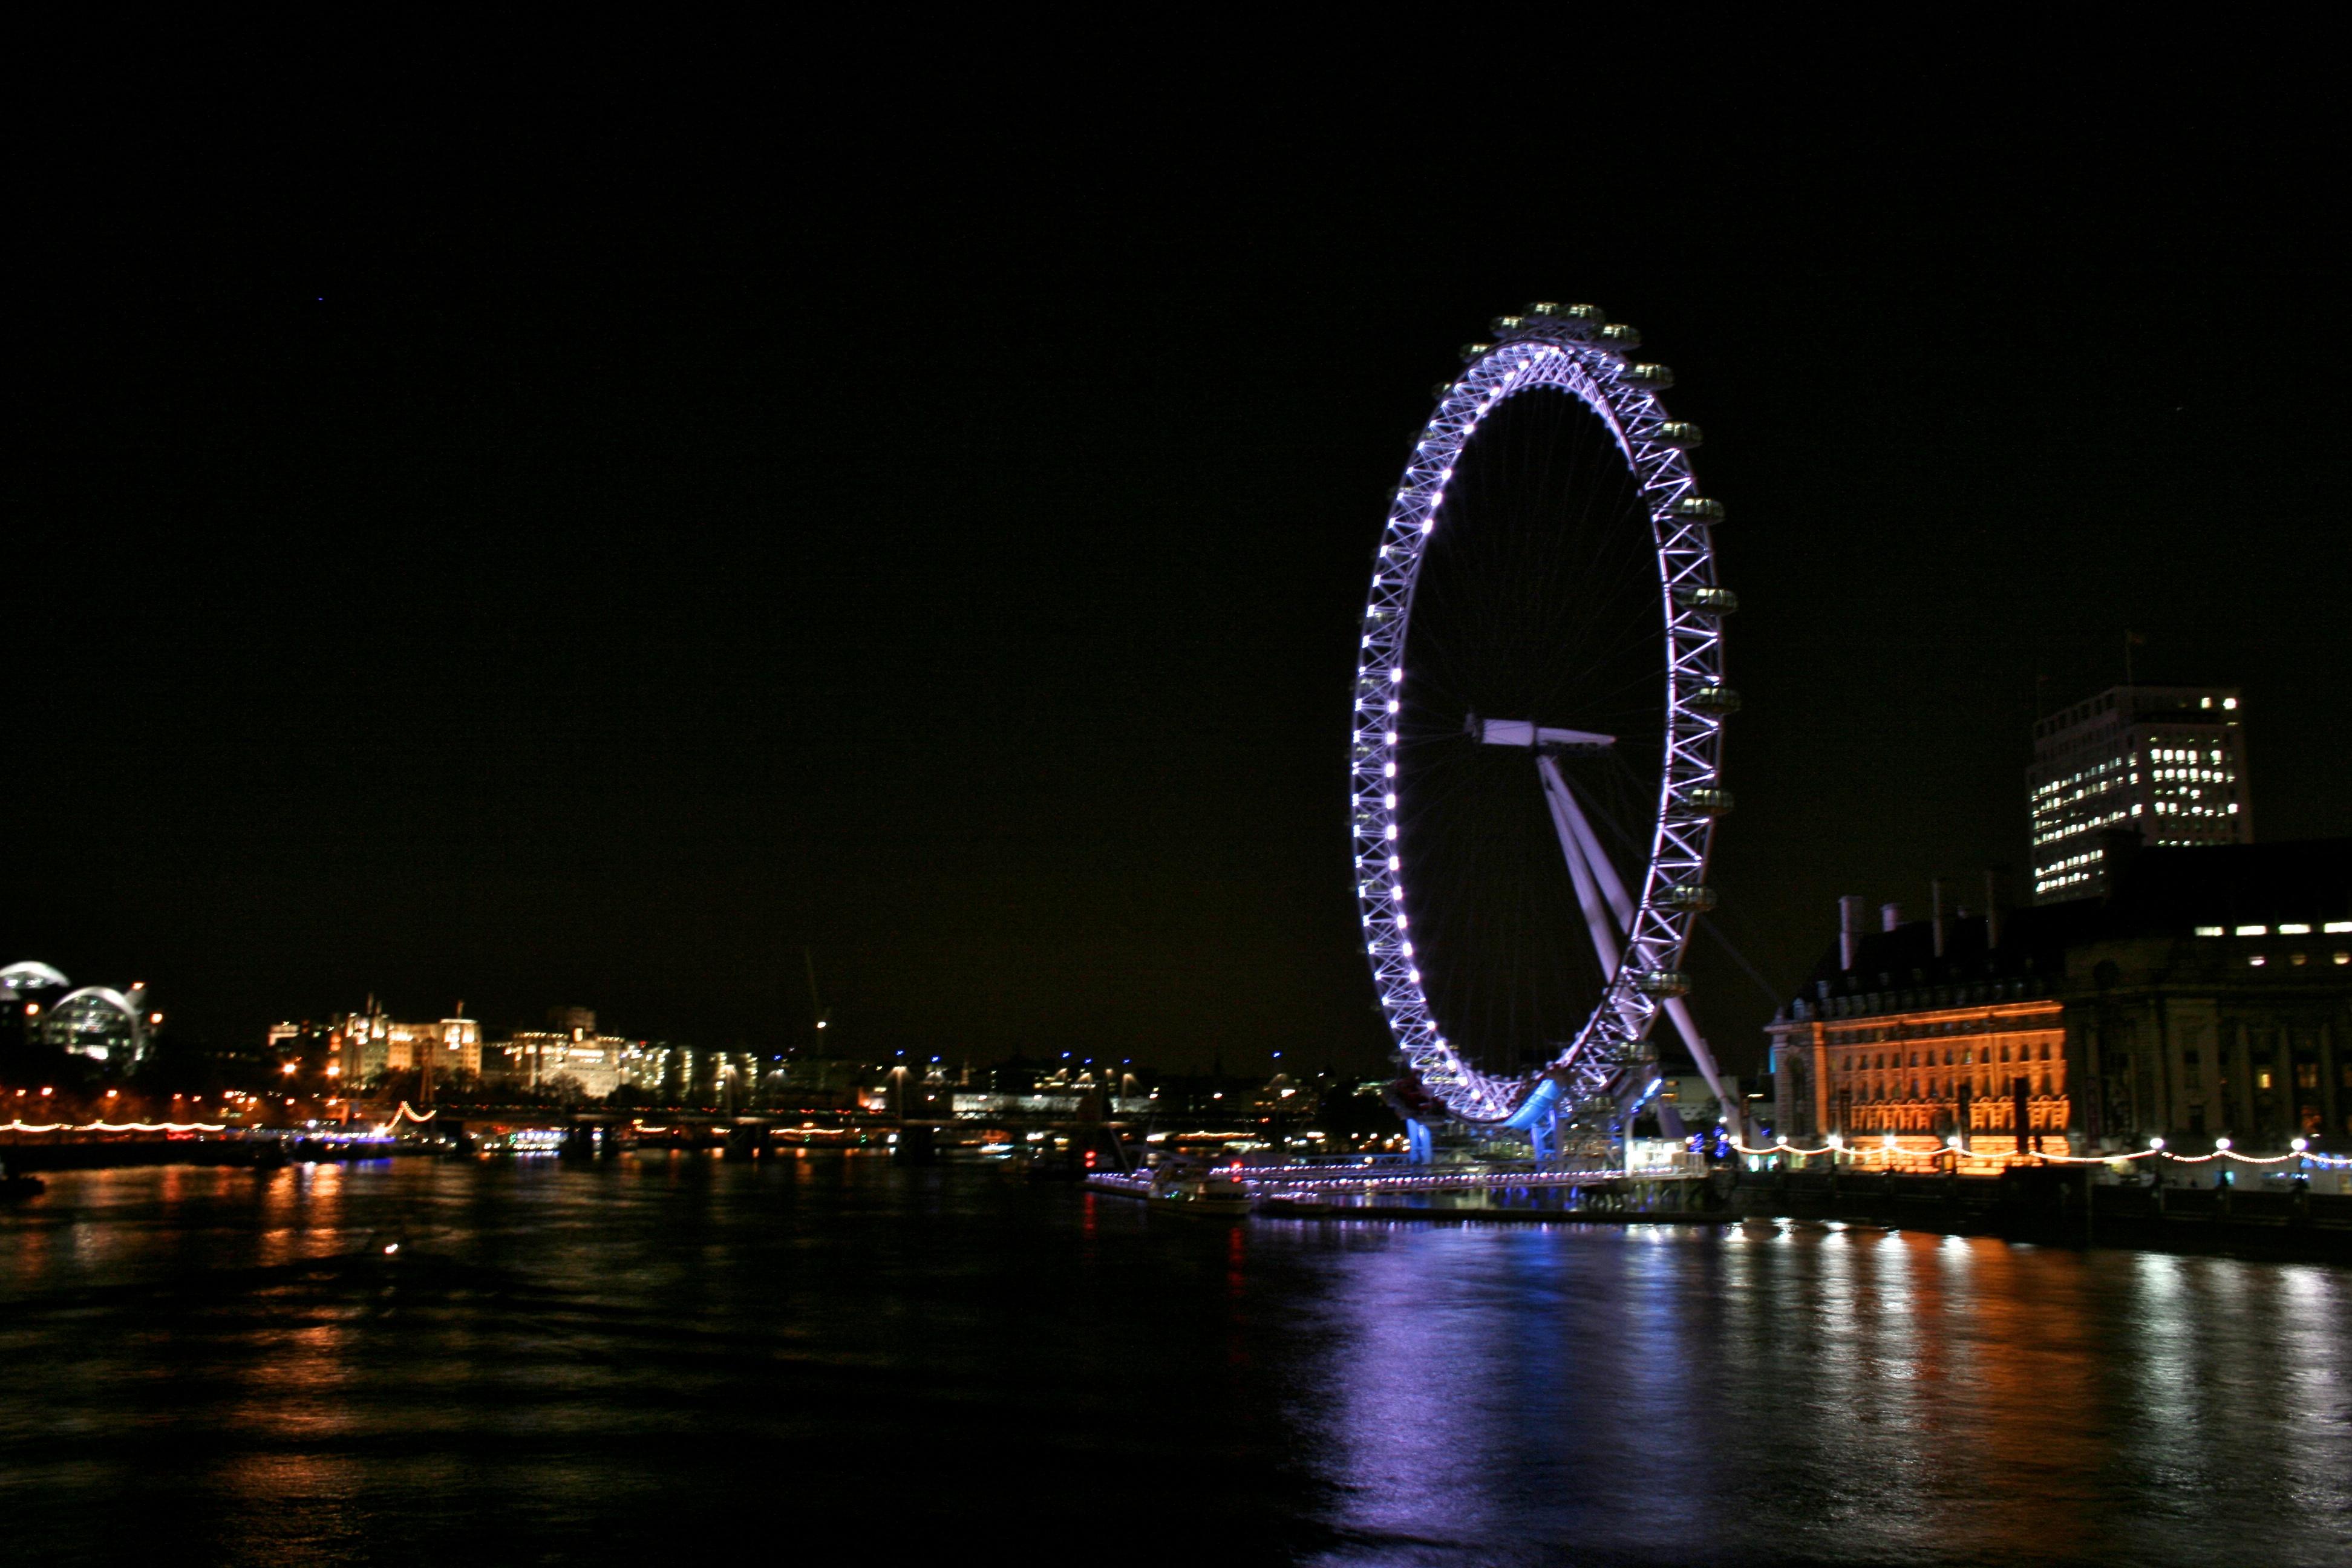 london eye by night - photo #20